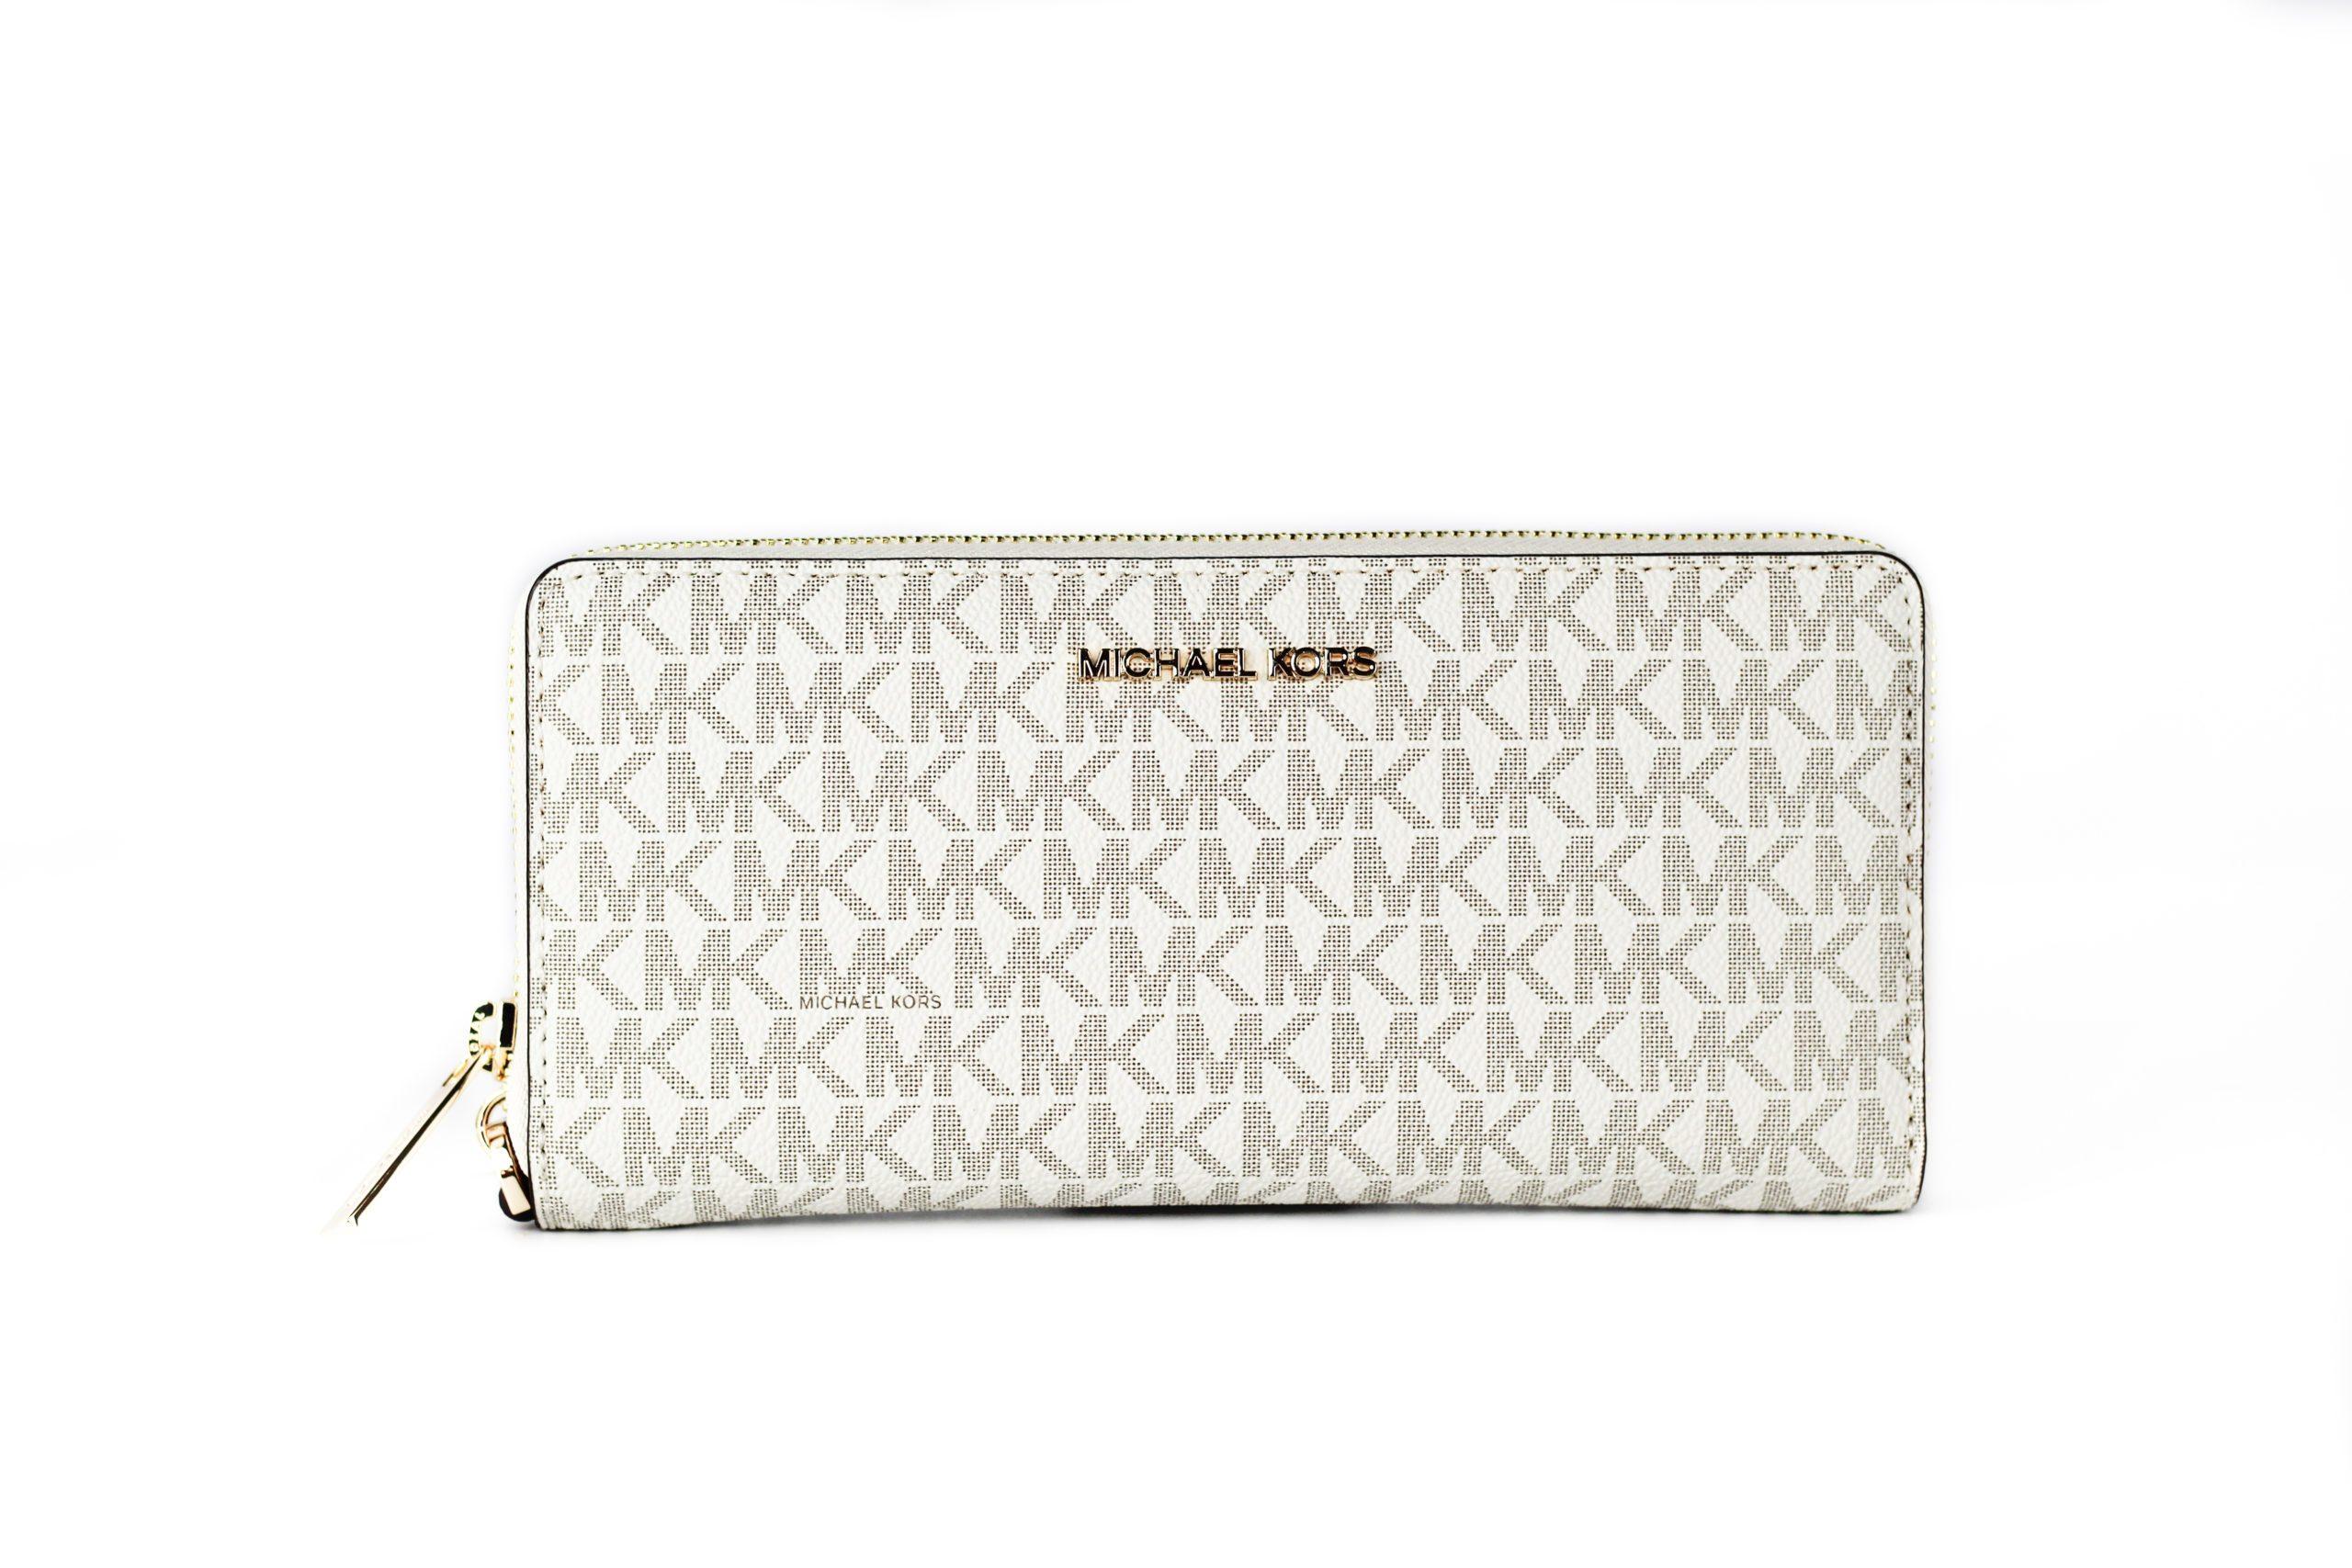 Michael Kors Women's Jet Set Clutch Bag White 38606